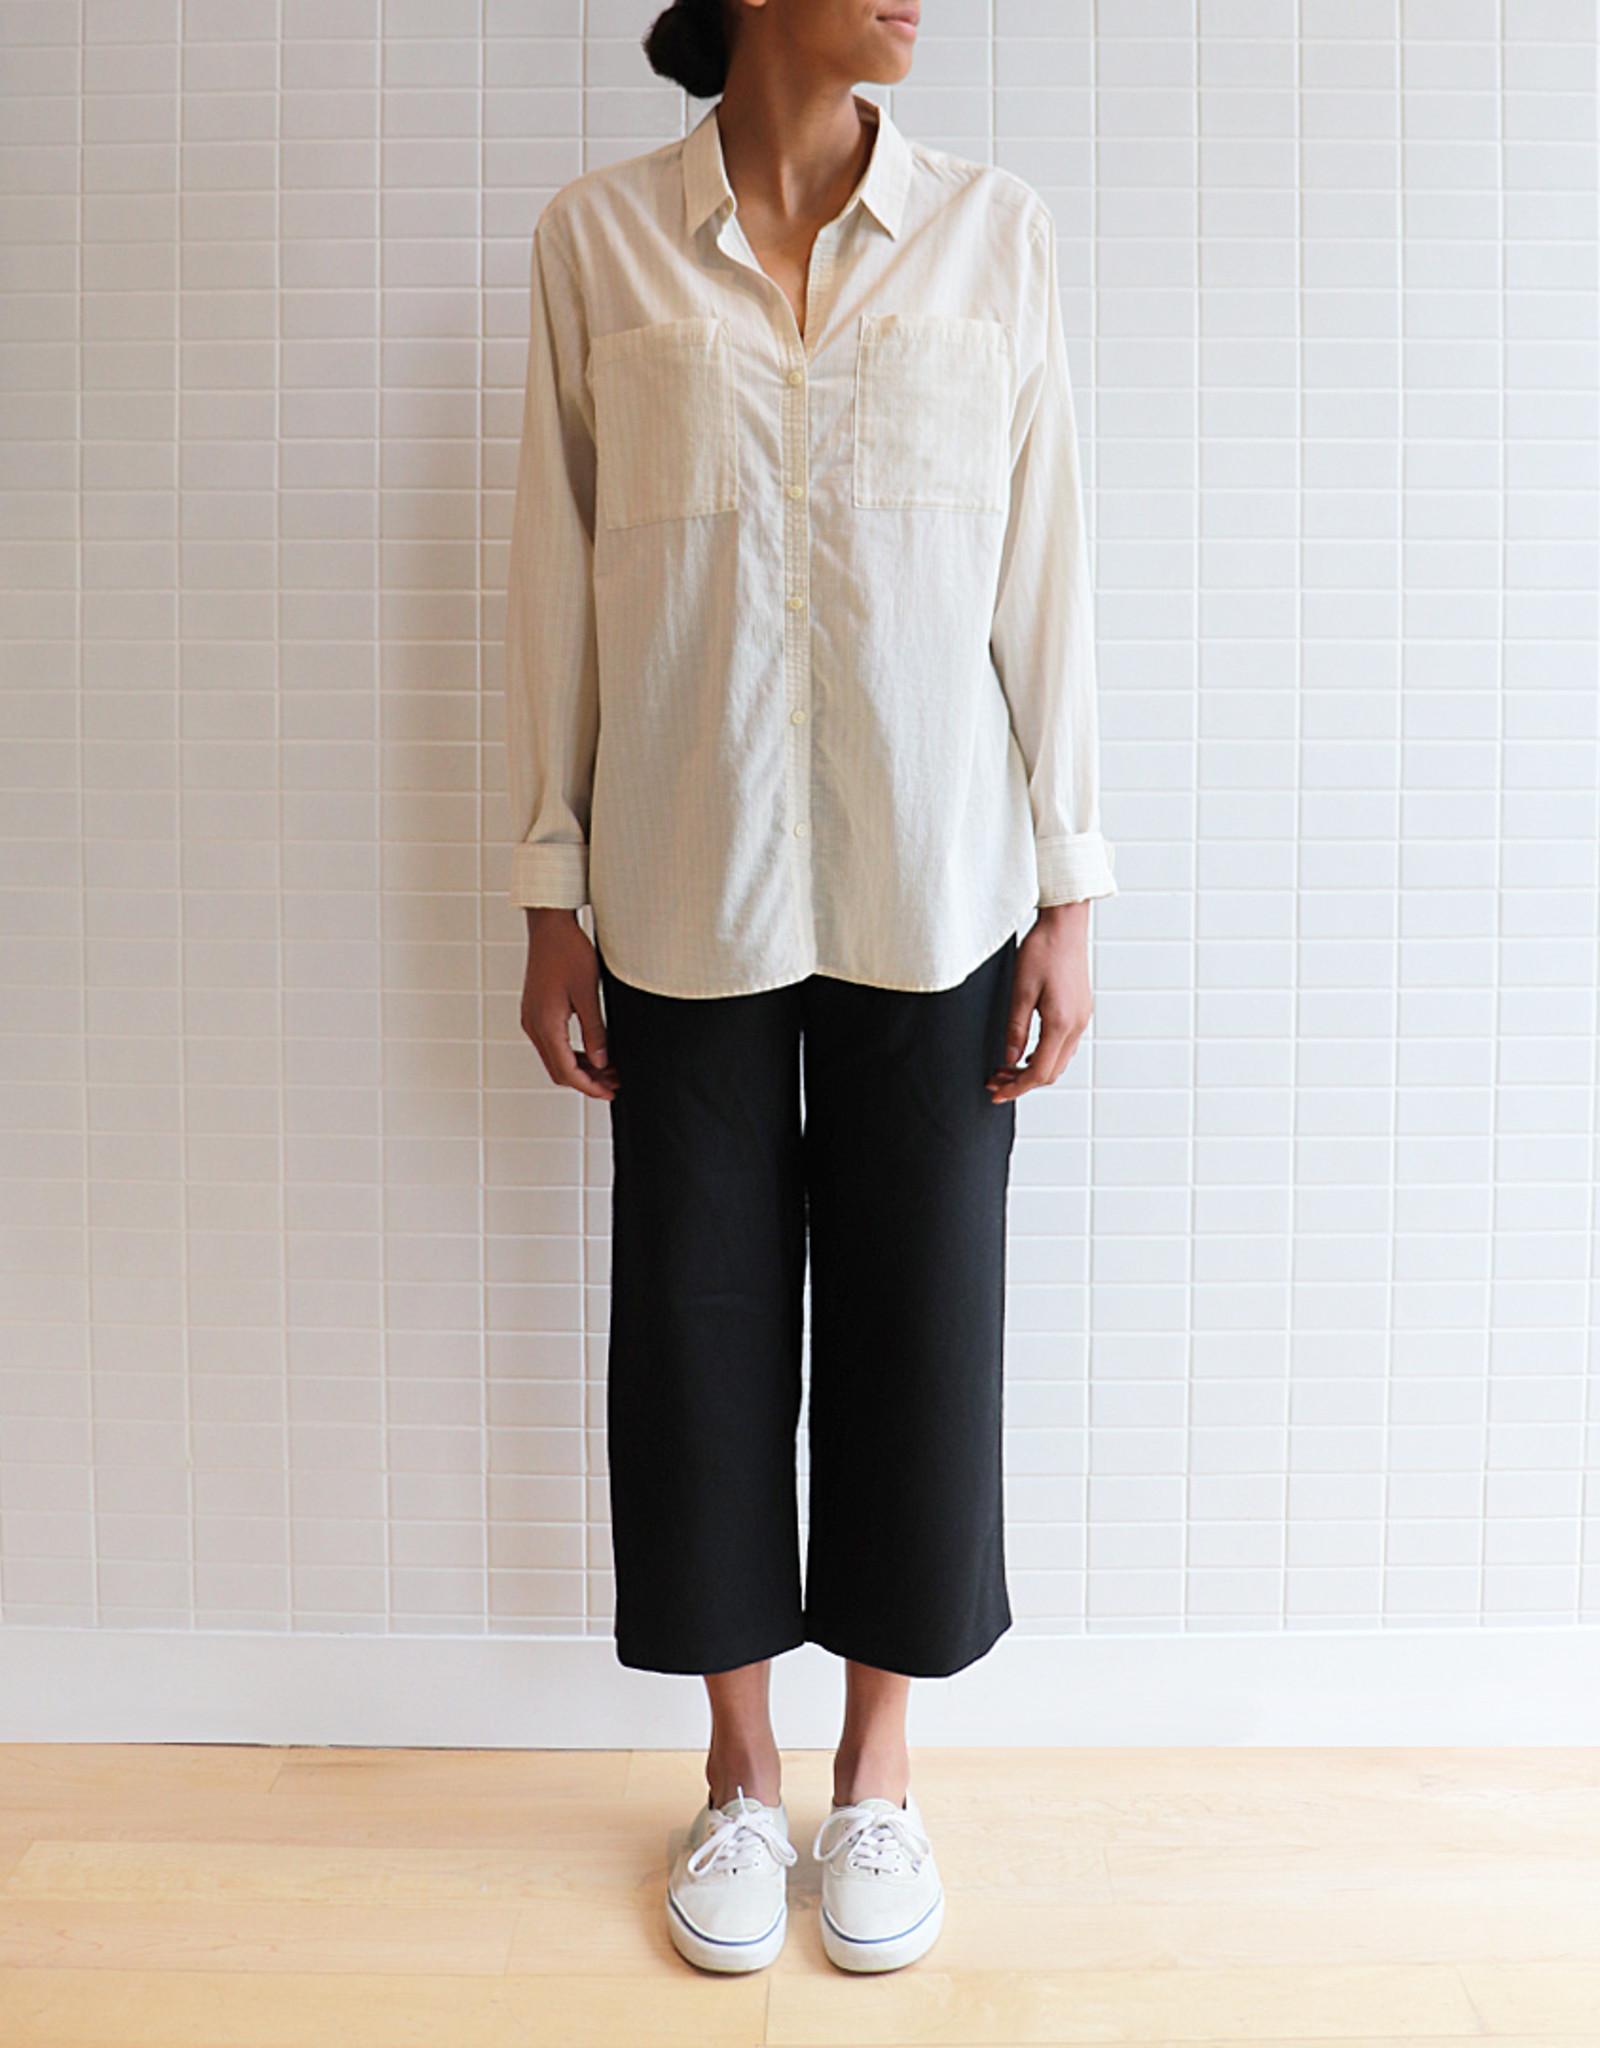 Patagonia - W's Lightweight Buttondown Shirt - Pumice